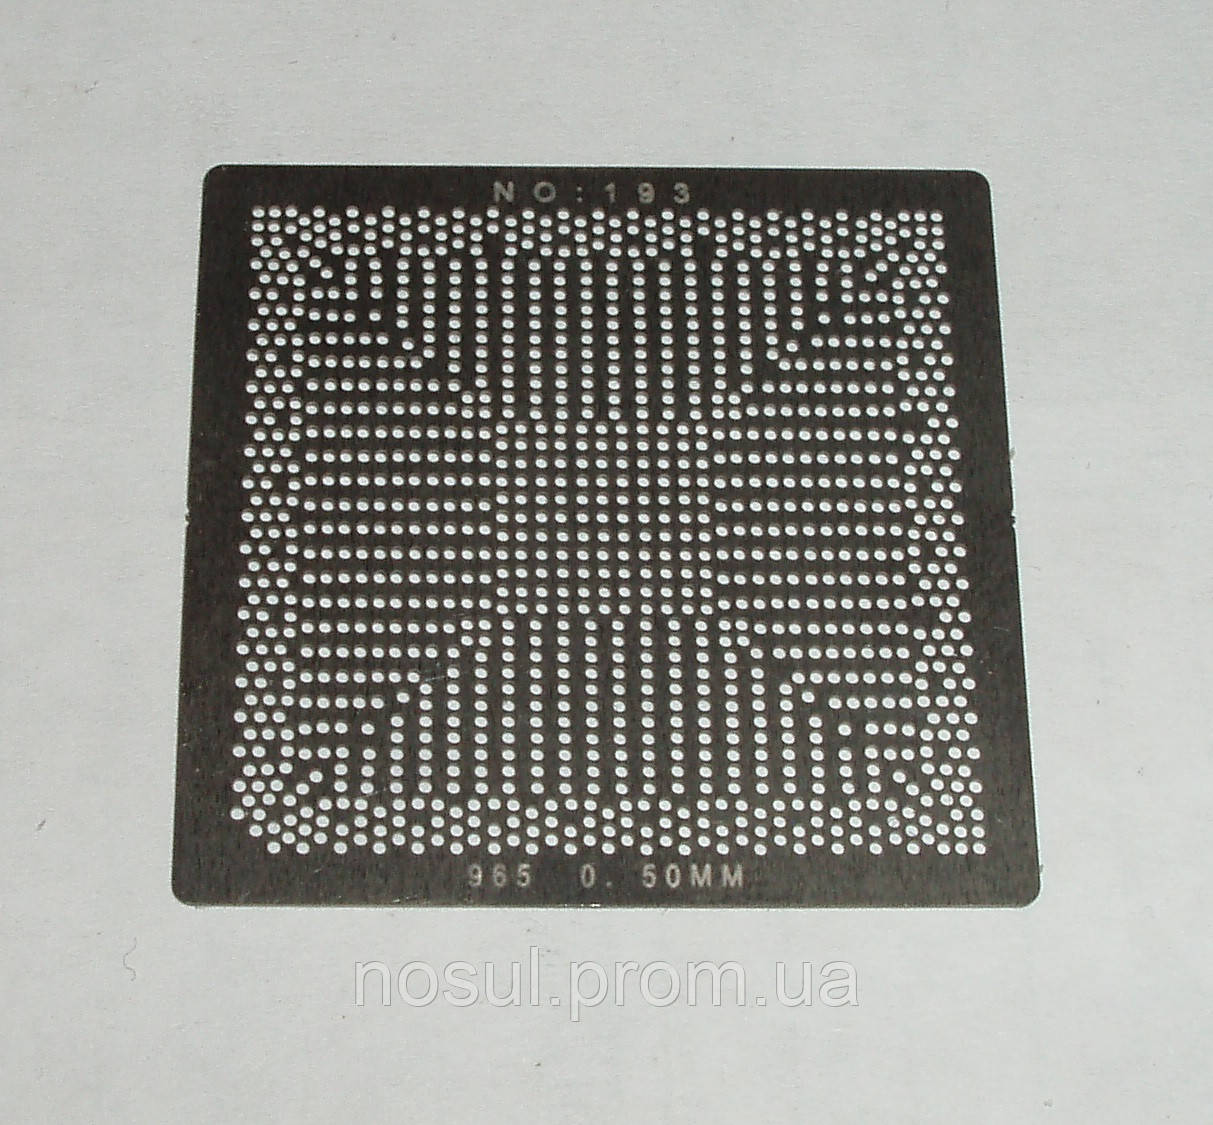 BGA шаблоны INTEL №193 0.5 mm 965 (82P965//82P31)G31) трафареты шаблоны для реболла реболинг набор восстановле